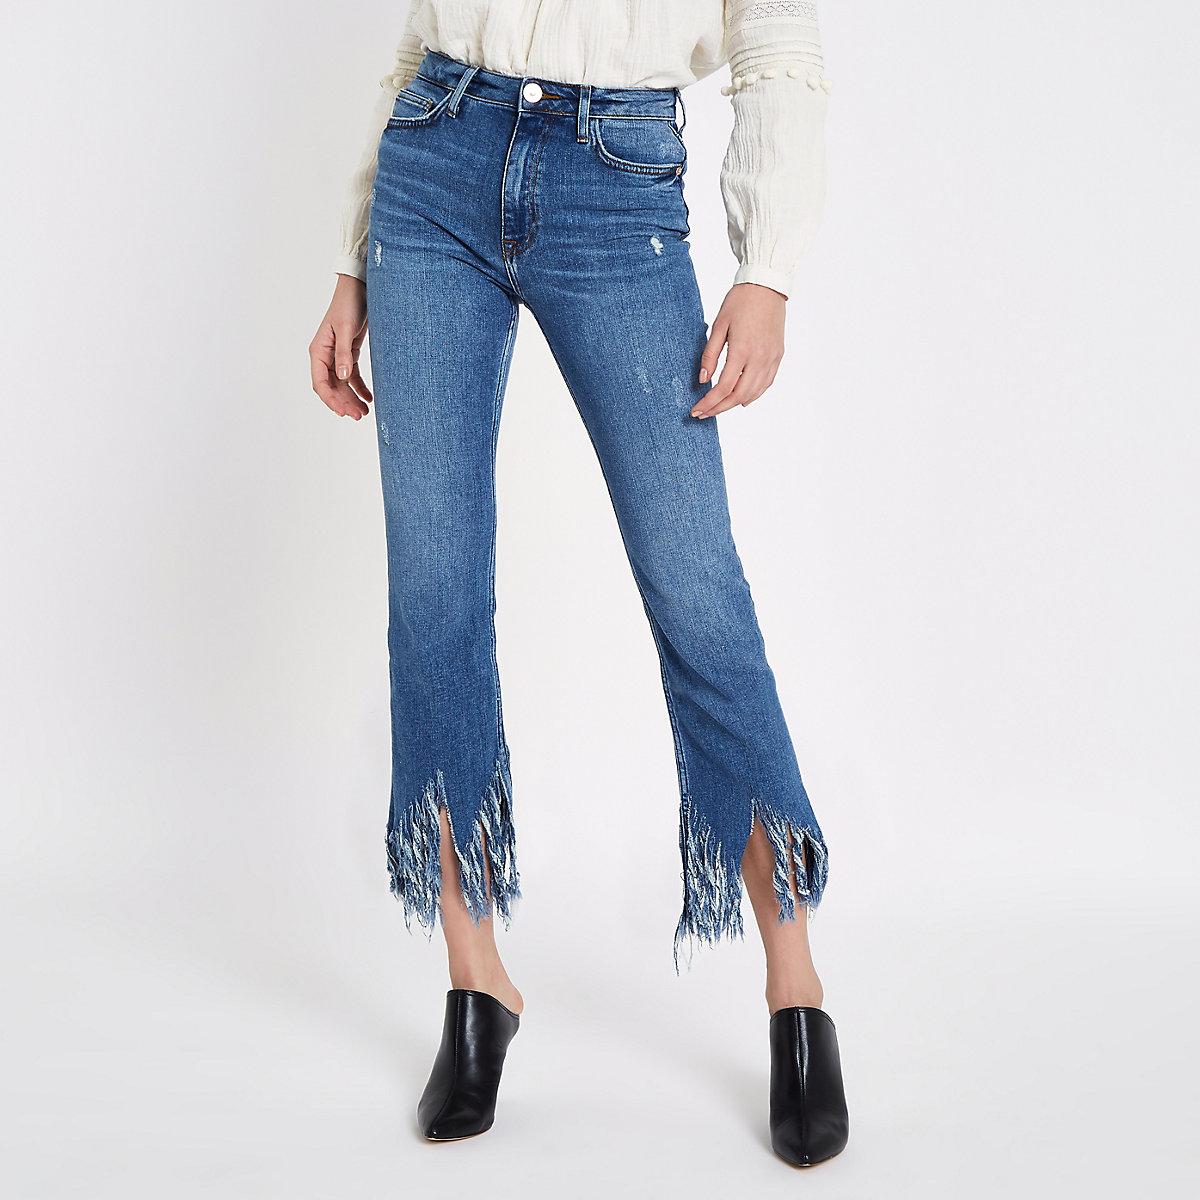 Middenblauwe cropped wijduitlopende jeans met gerafelde zoom